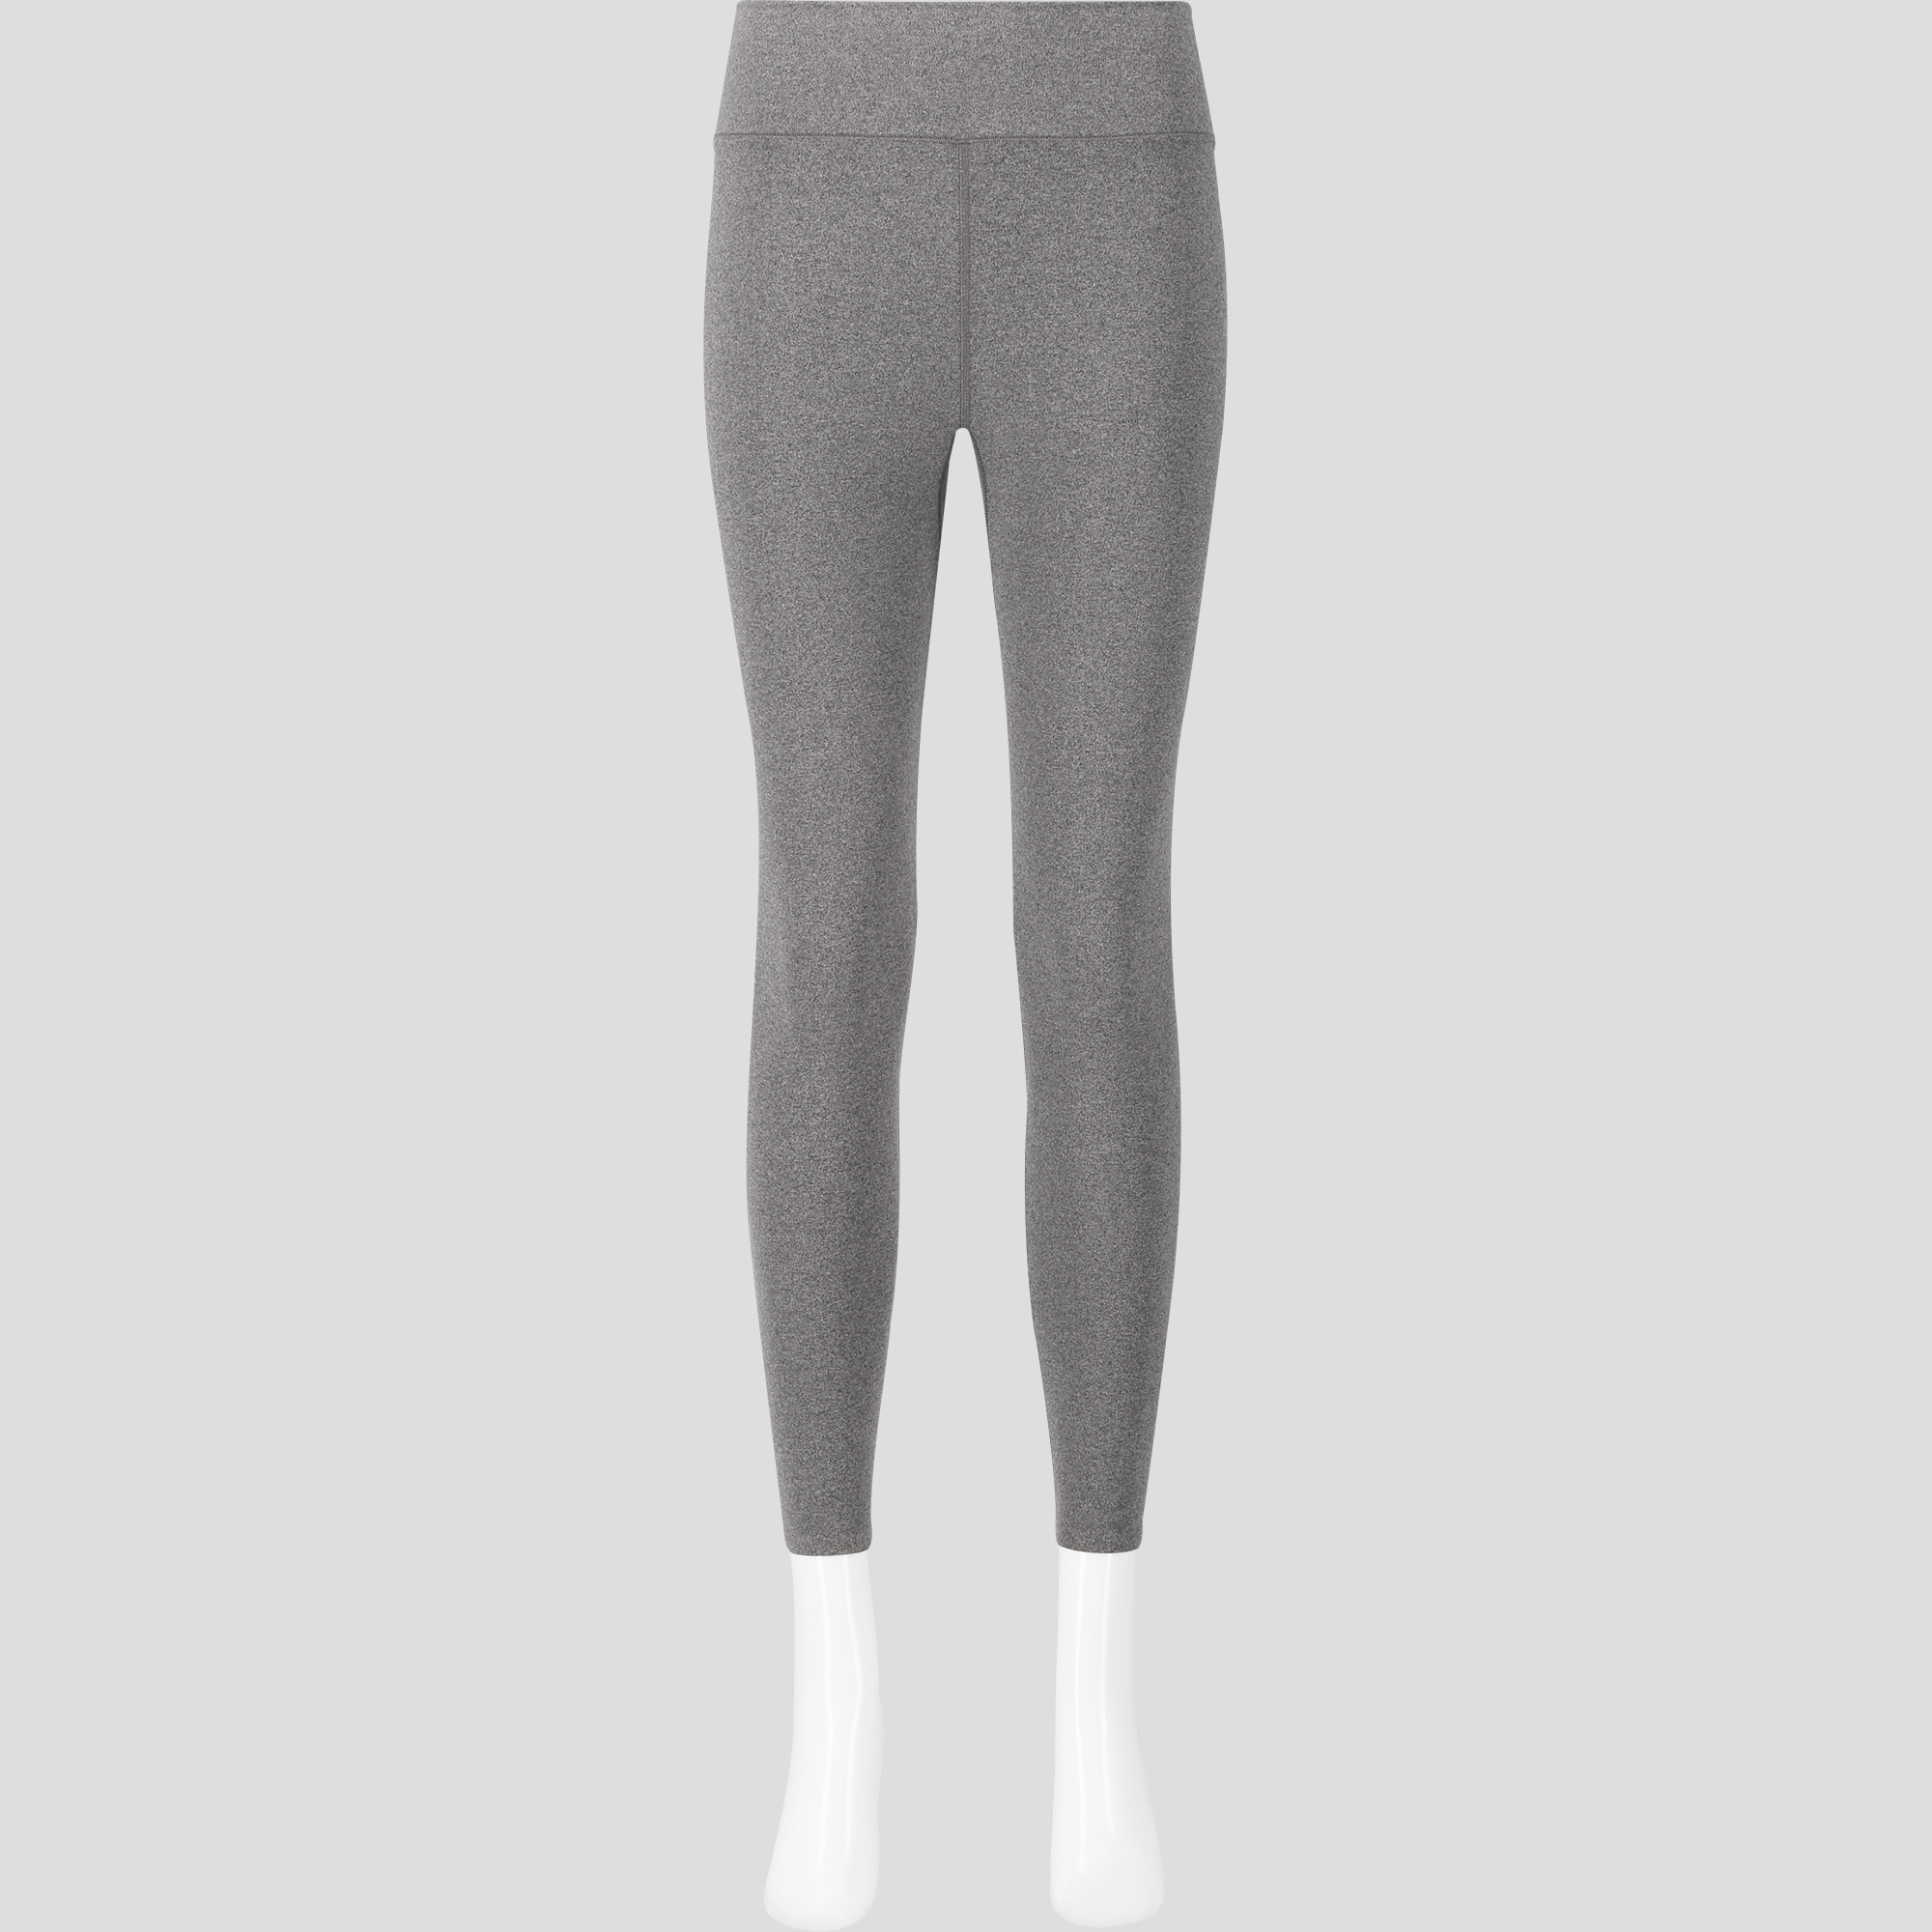 quần legging nữ airism uniqlo màu xám